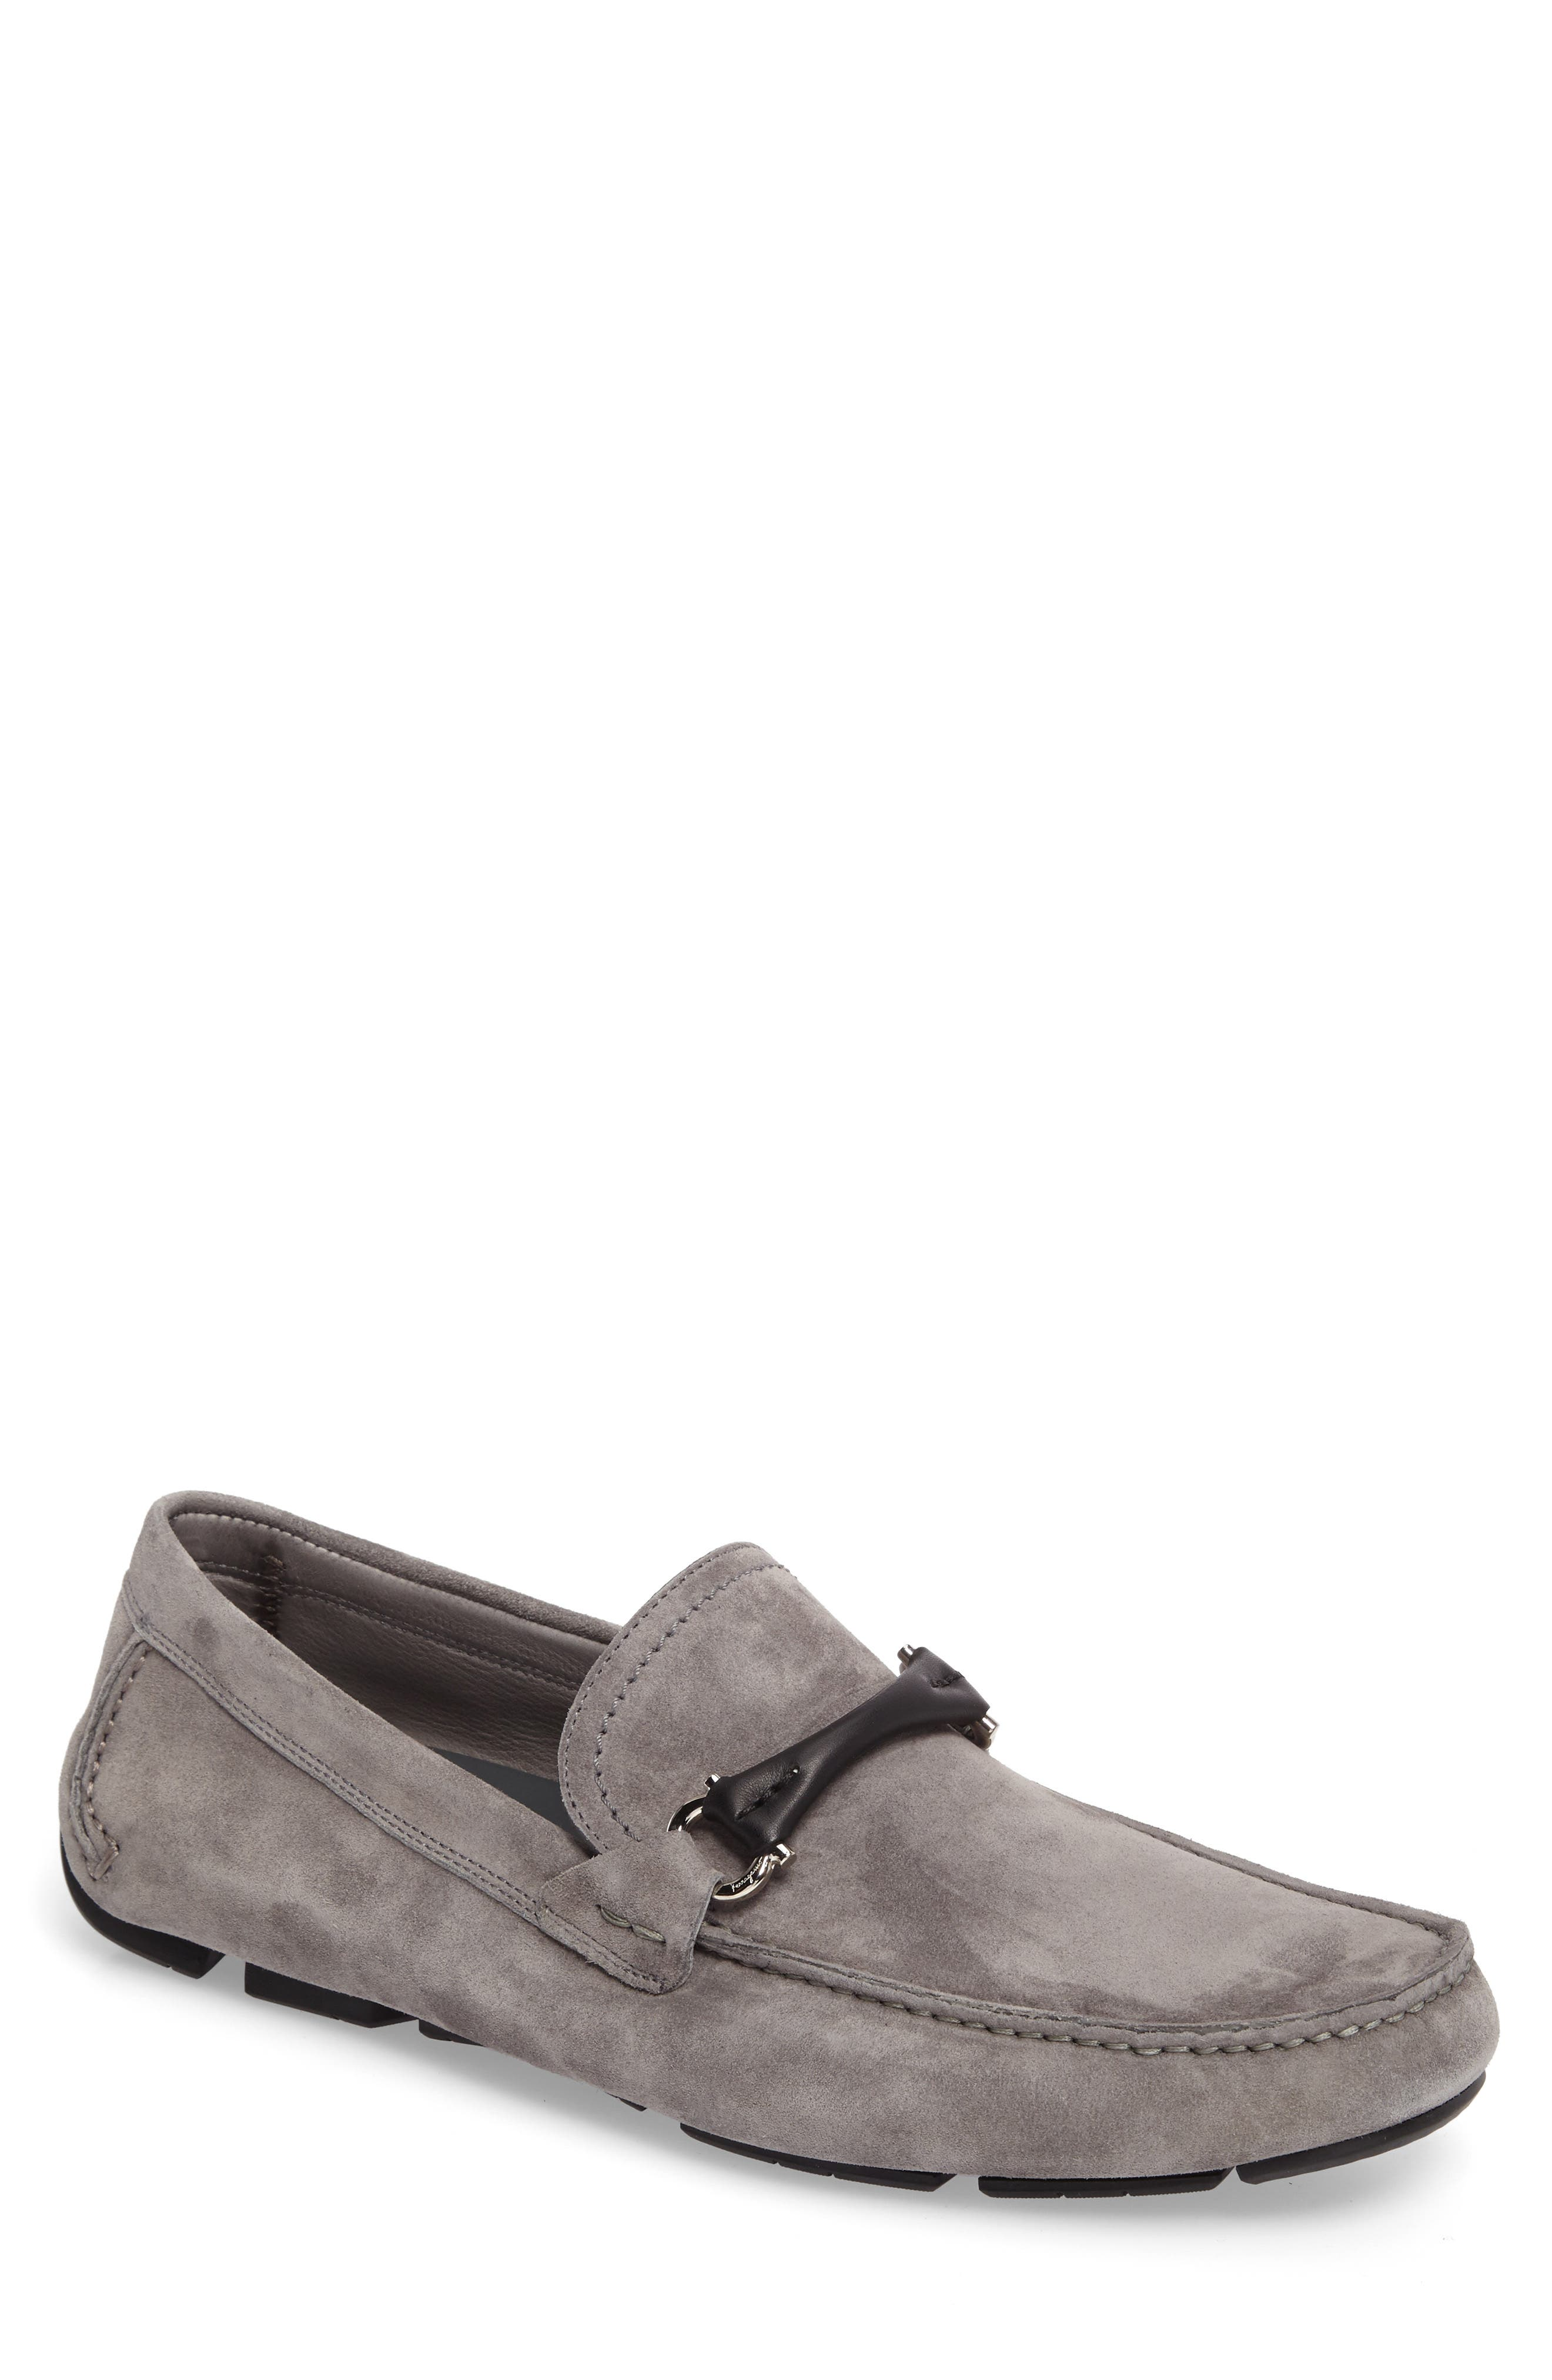 Alternate Image 1 Selected - Salvatore Ferragamo GranprixDriving Shoe (Men)